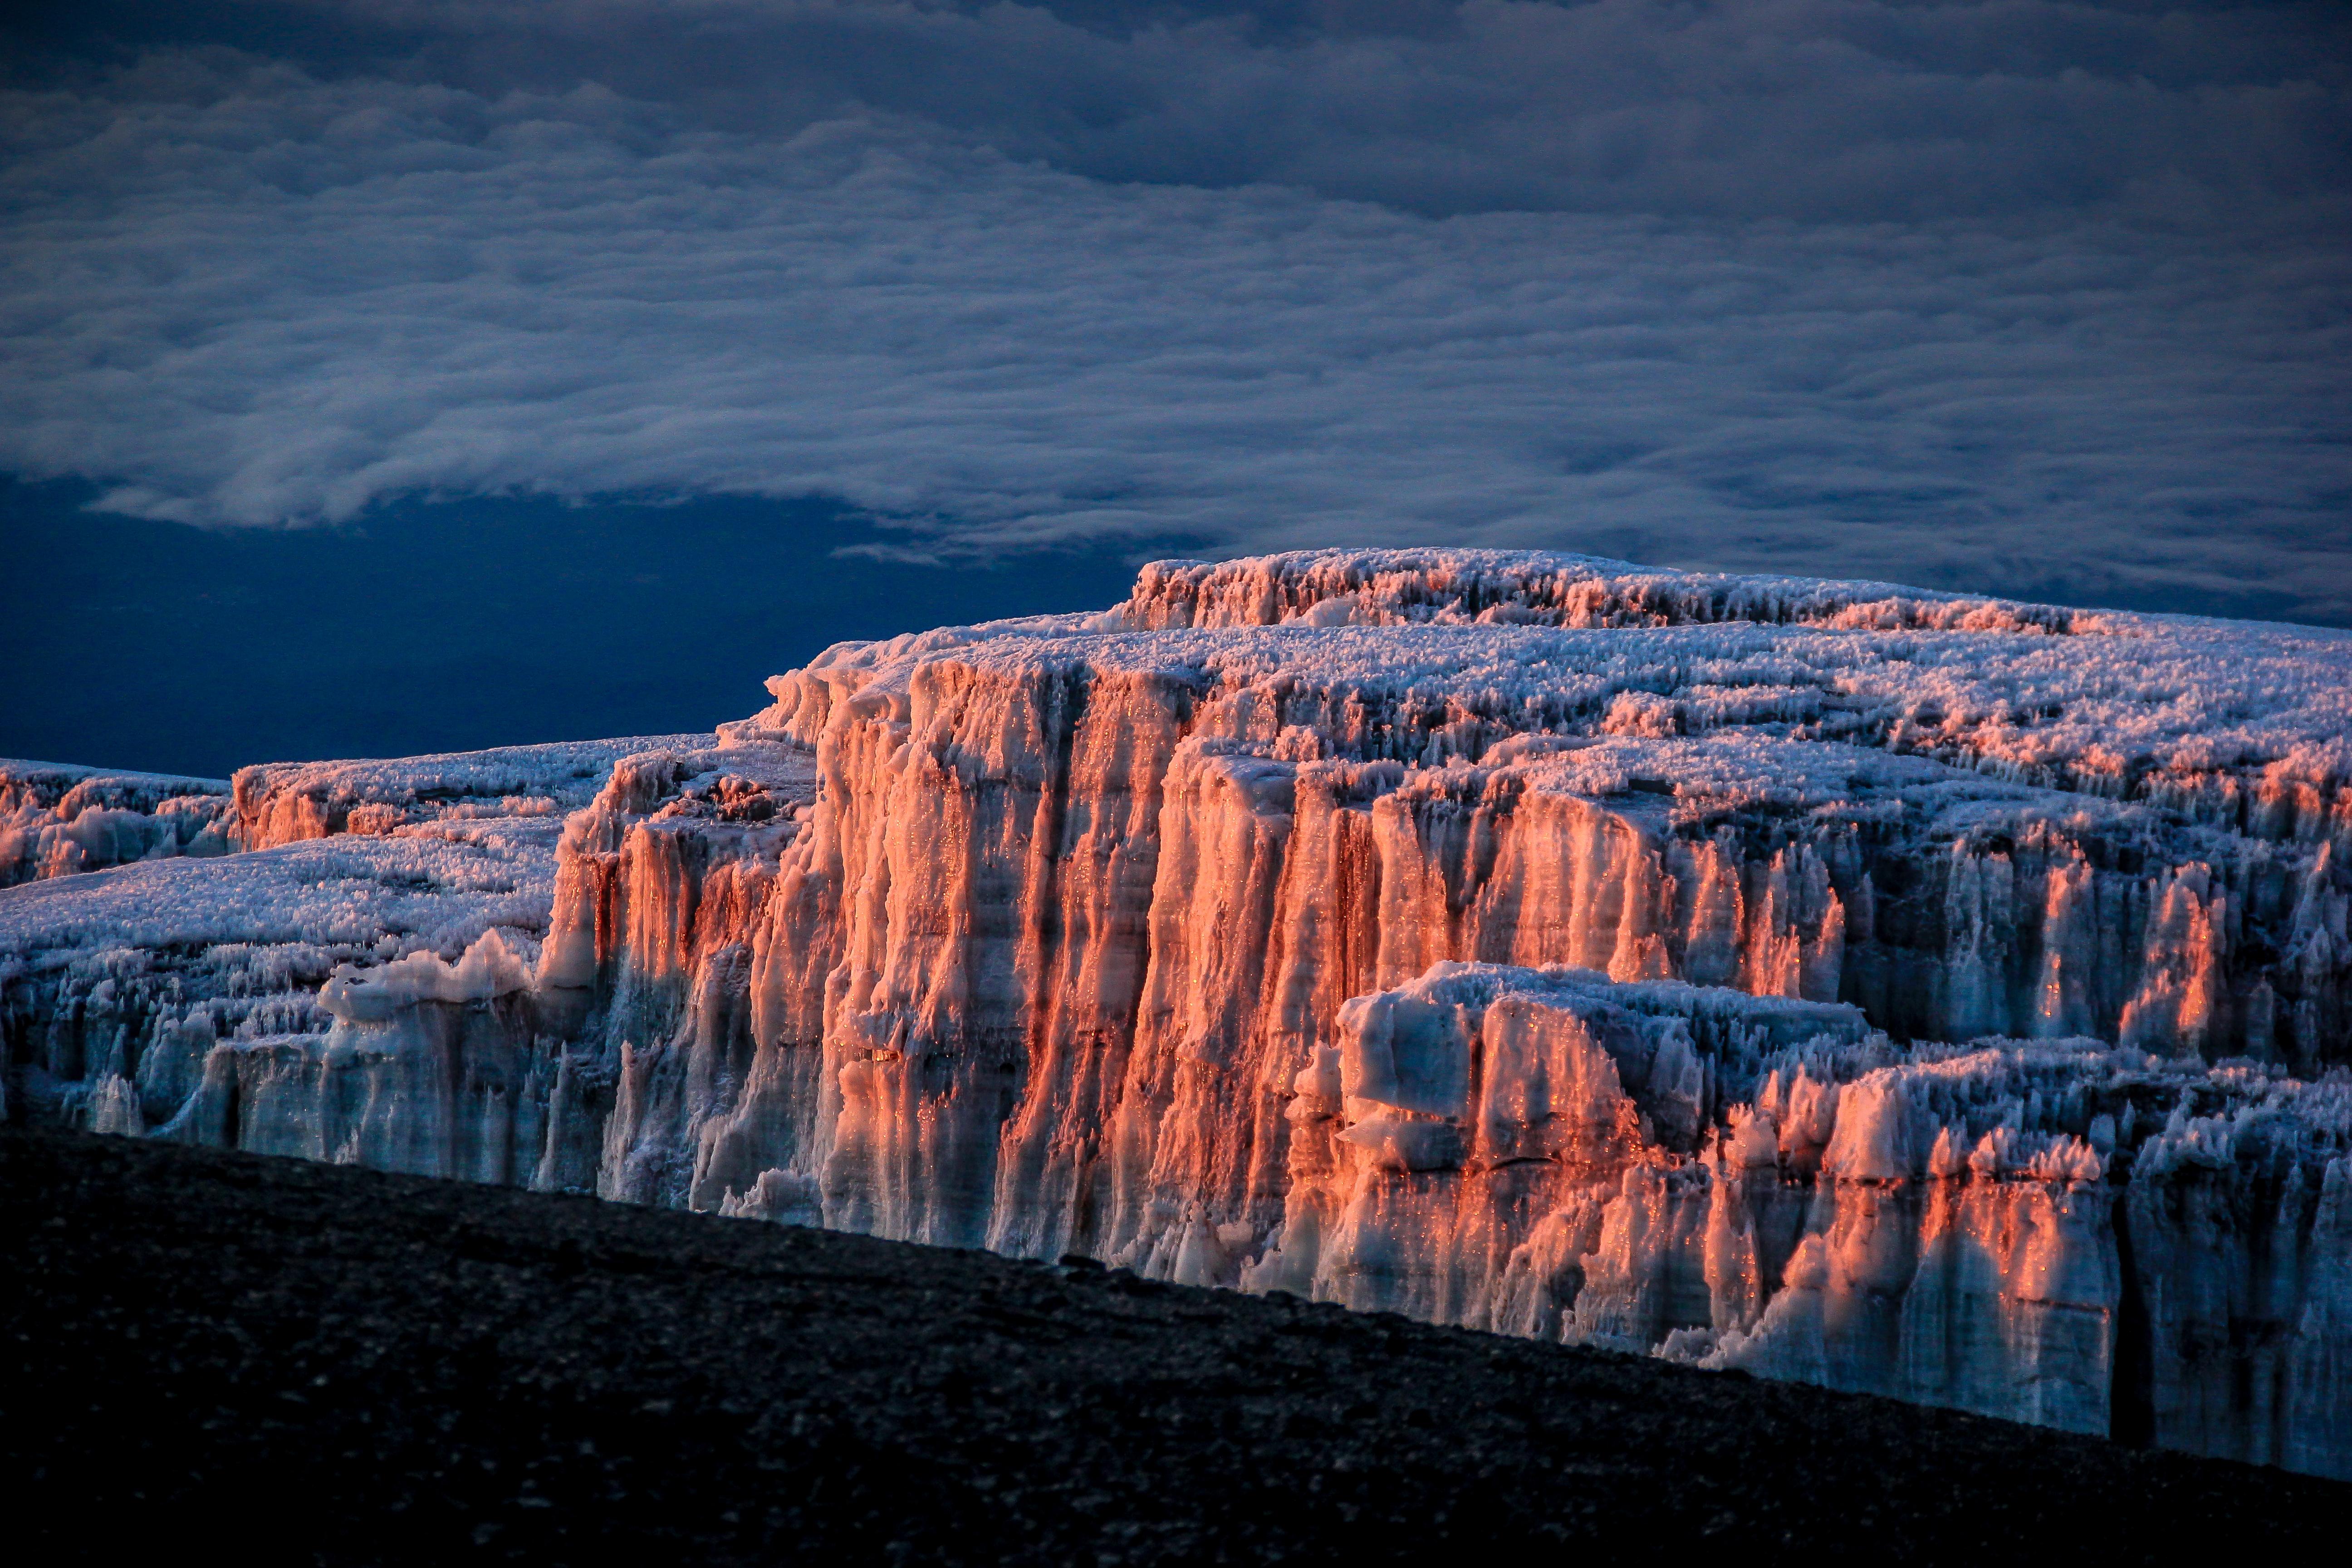 Southern Ice Field on Kilimanjaro